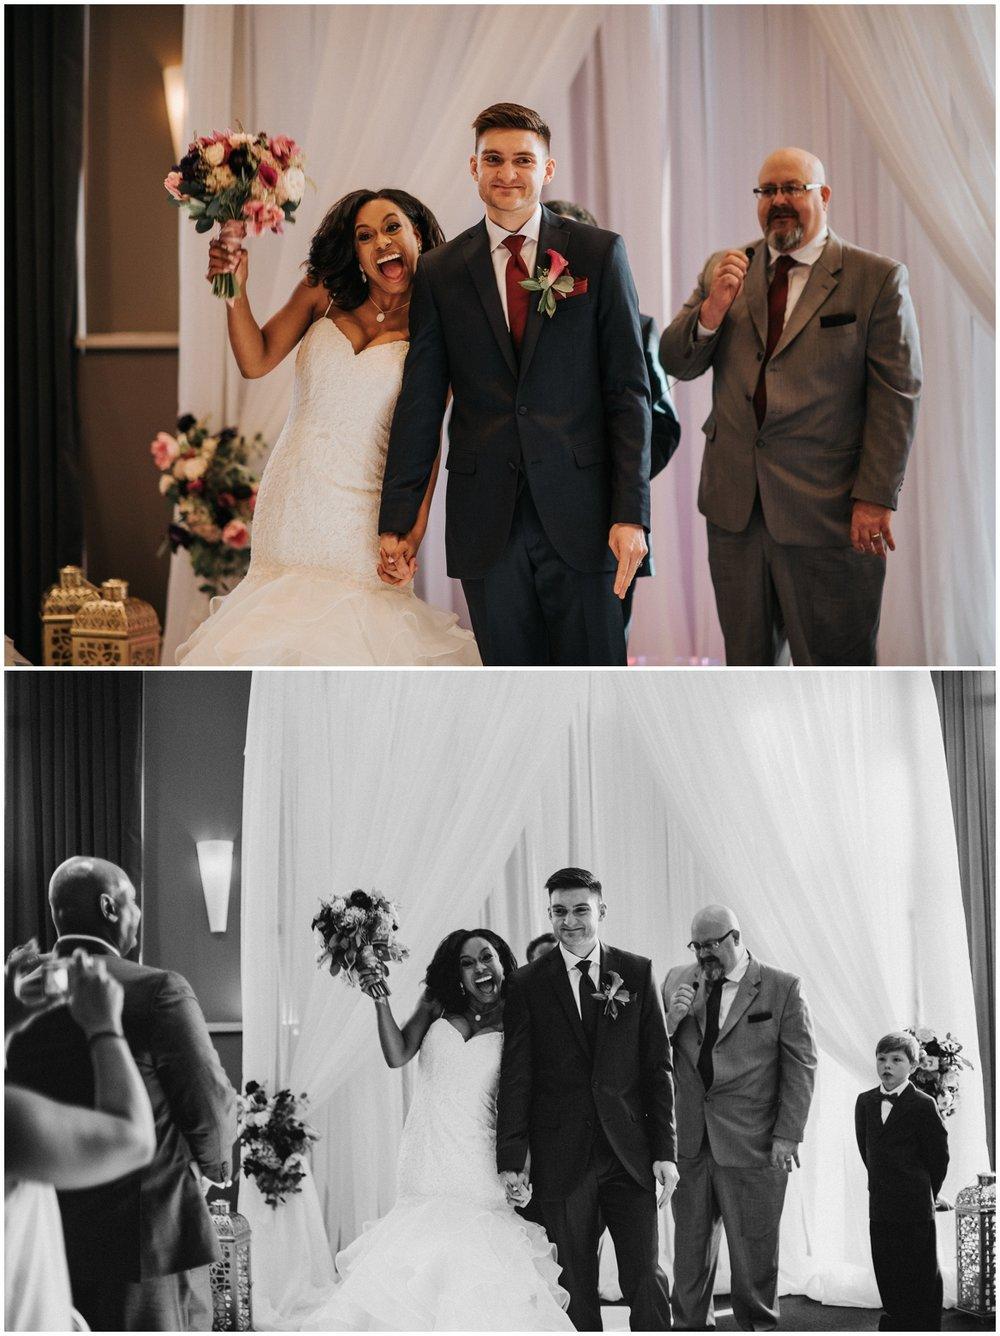 shipley_memphis_wedding_photographer_124.jpg